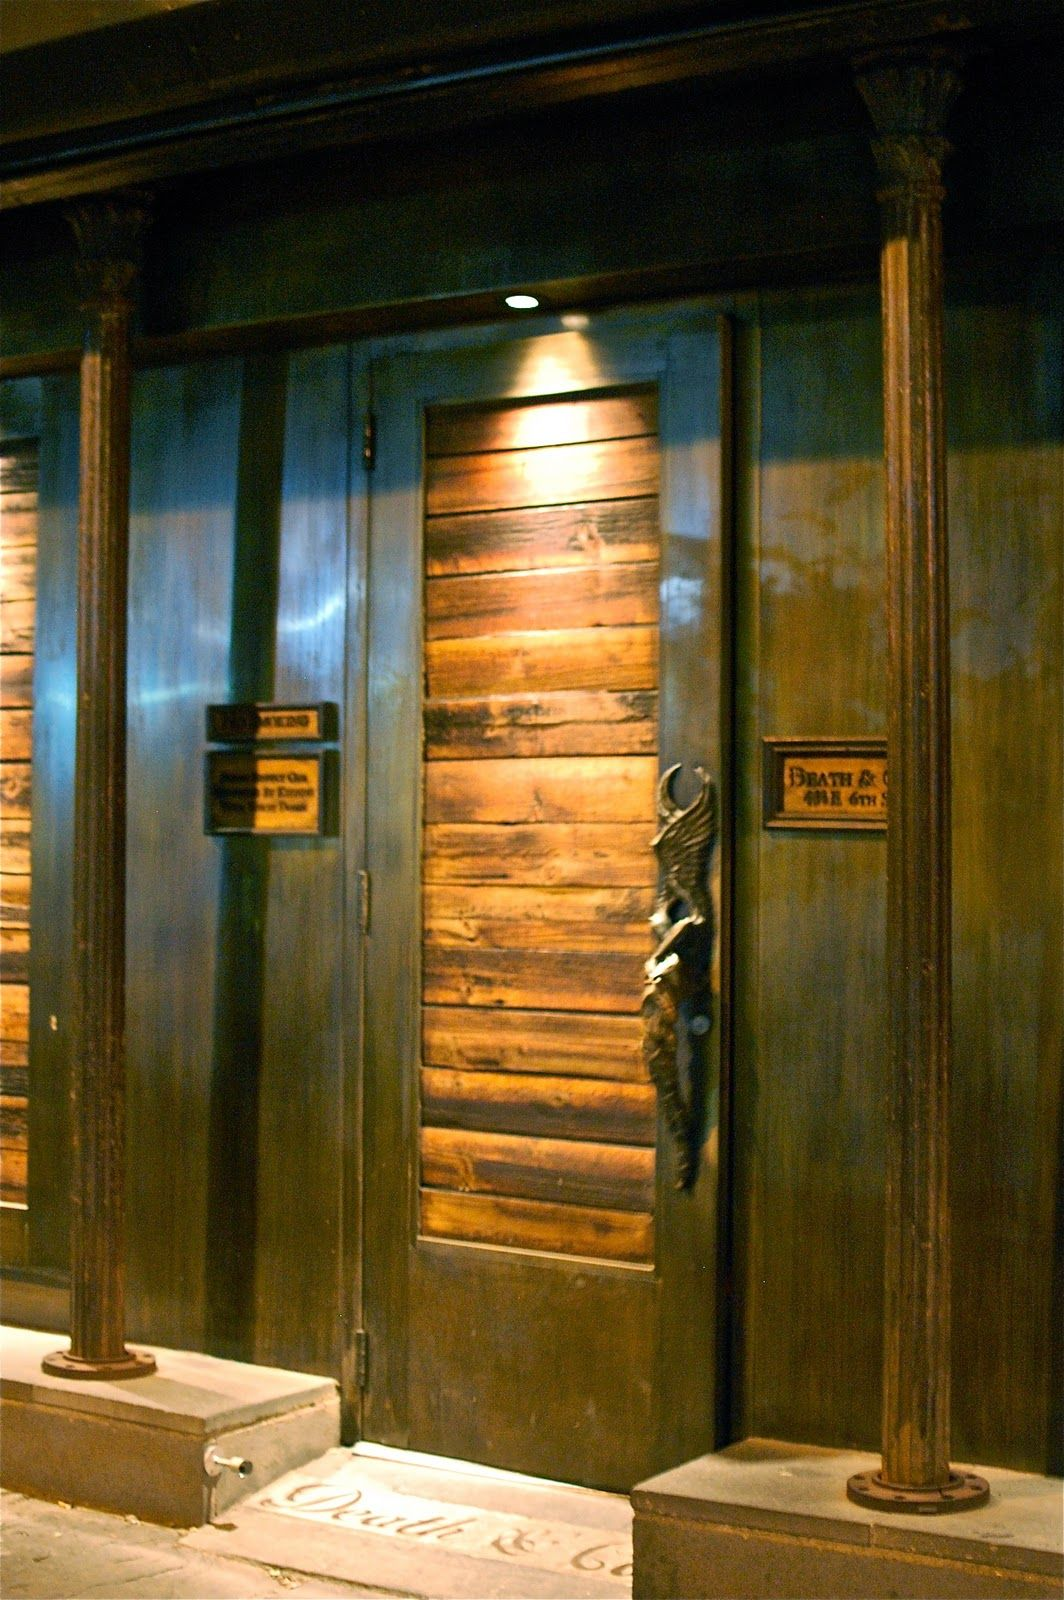 The entrance to Death & Co stranger bar Pinterest